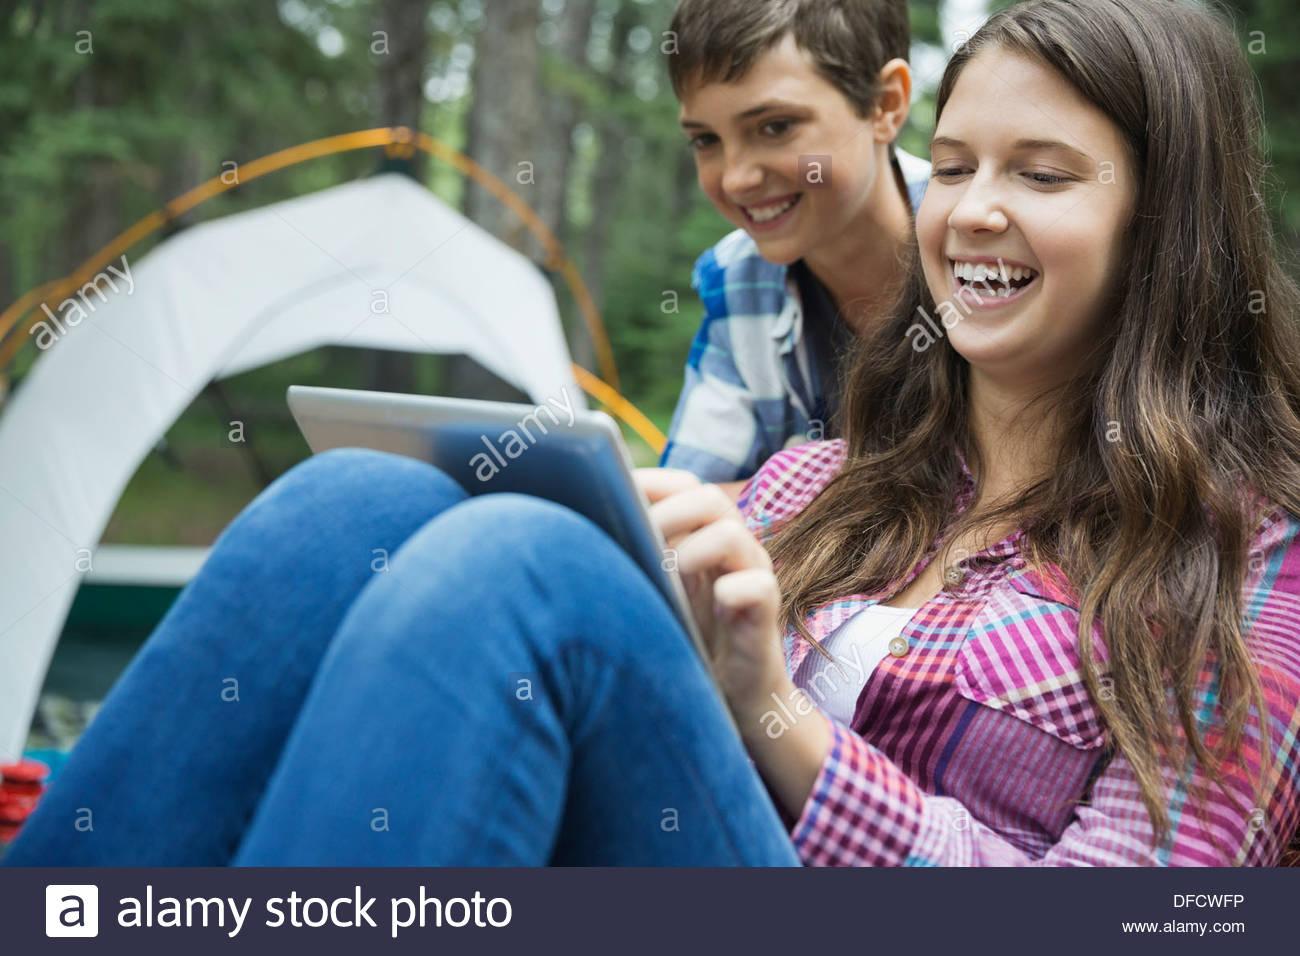 Siblings watching digital tablet at campsite Stock Photo